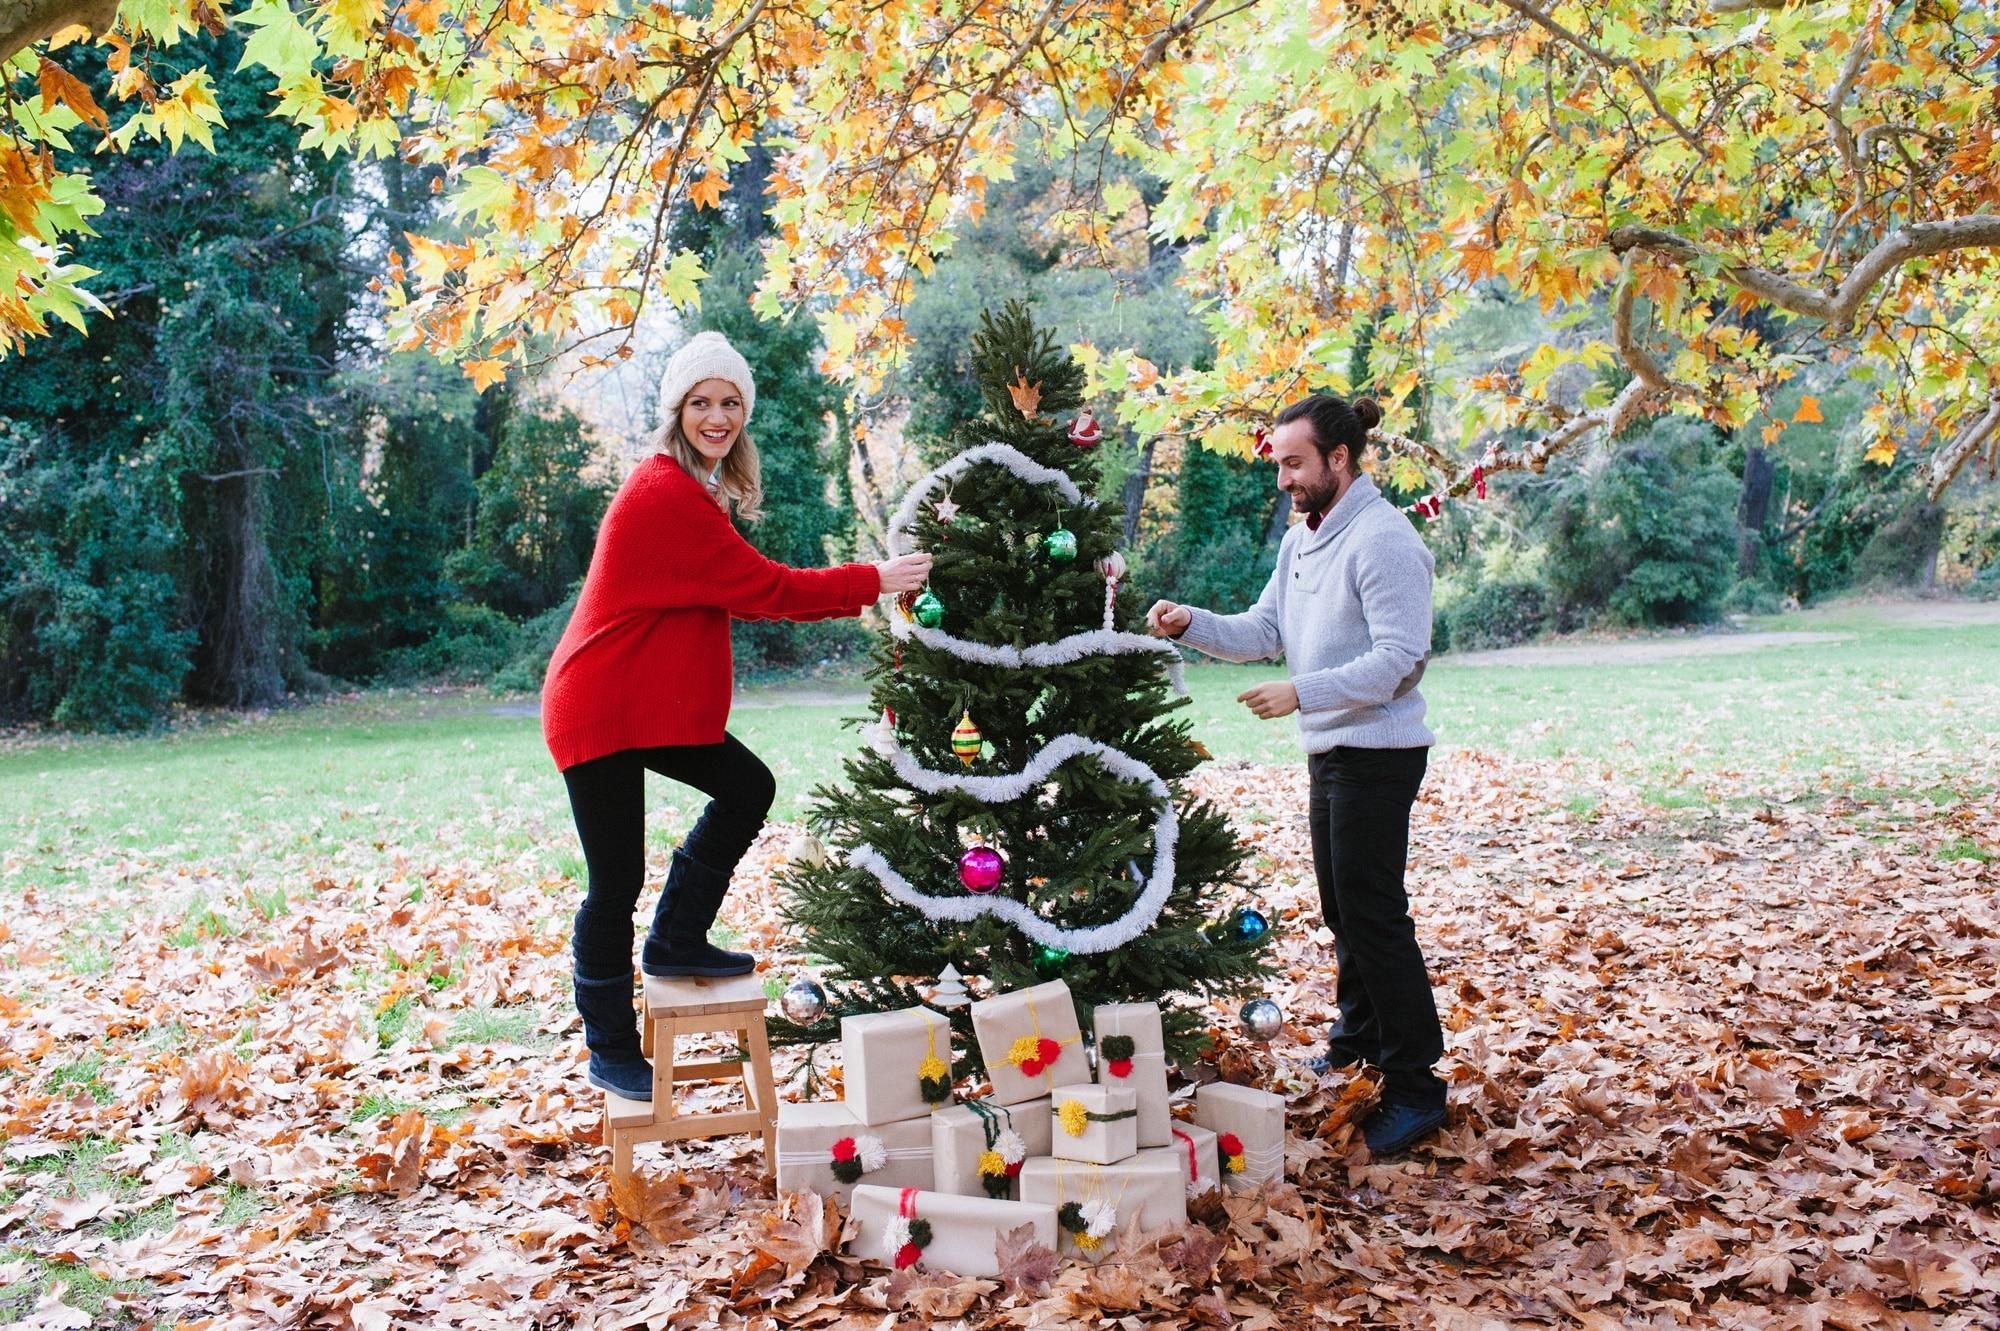 A Christmas Love shoot